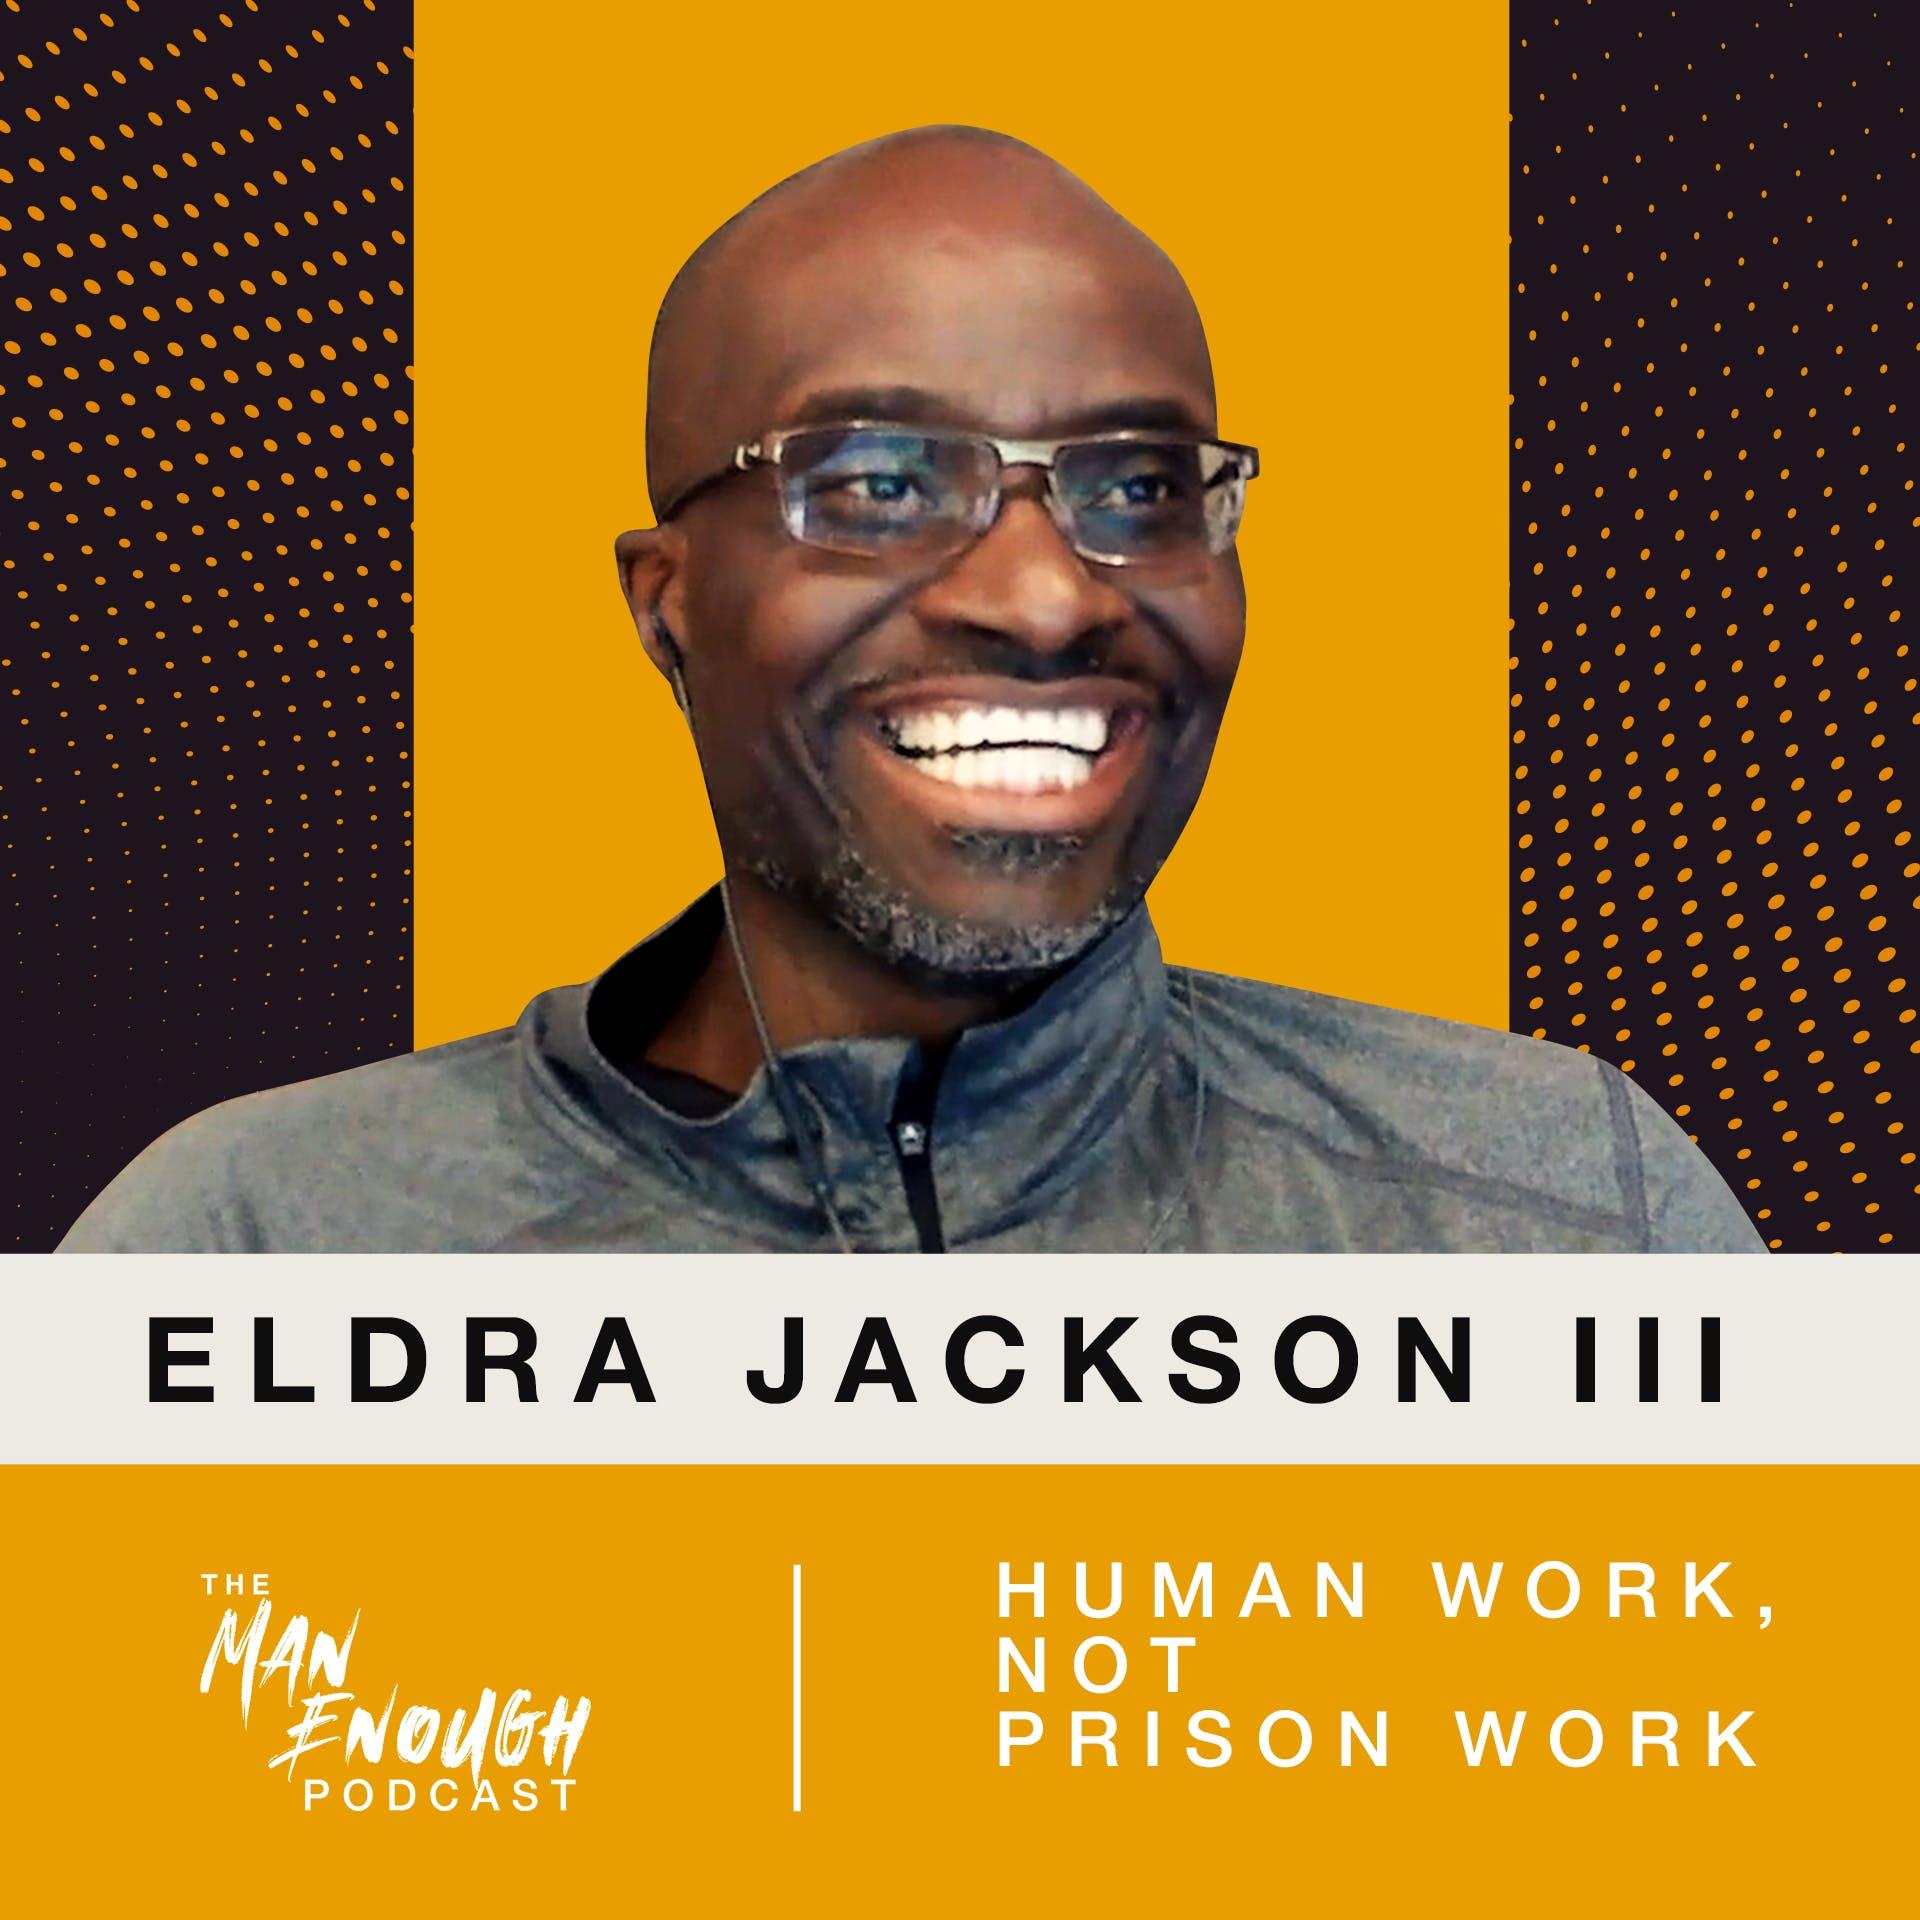 Eldra Jackson III: Human Work, Not Prison Work